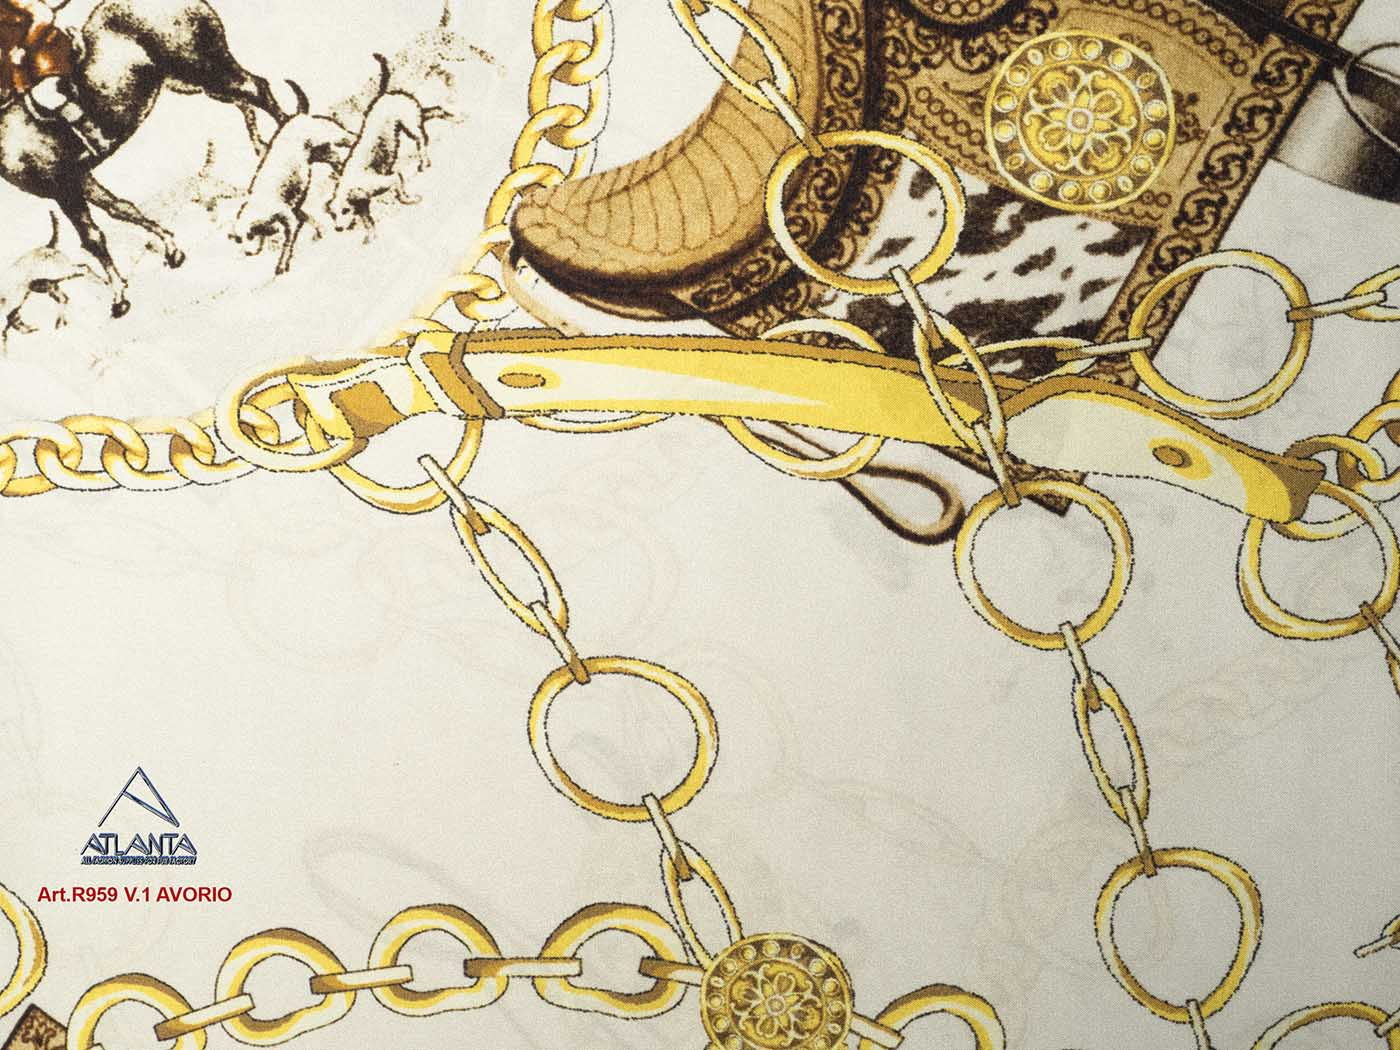 Art.R959 SATIN FLORIDA DIS.67020 INK JET PRINT POLYESTER 100% Image